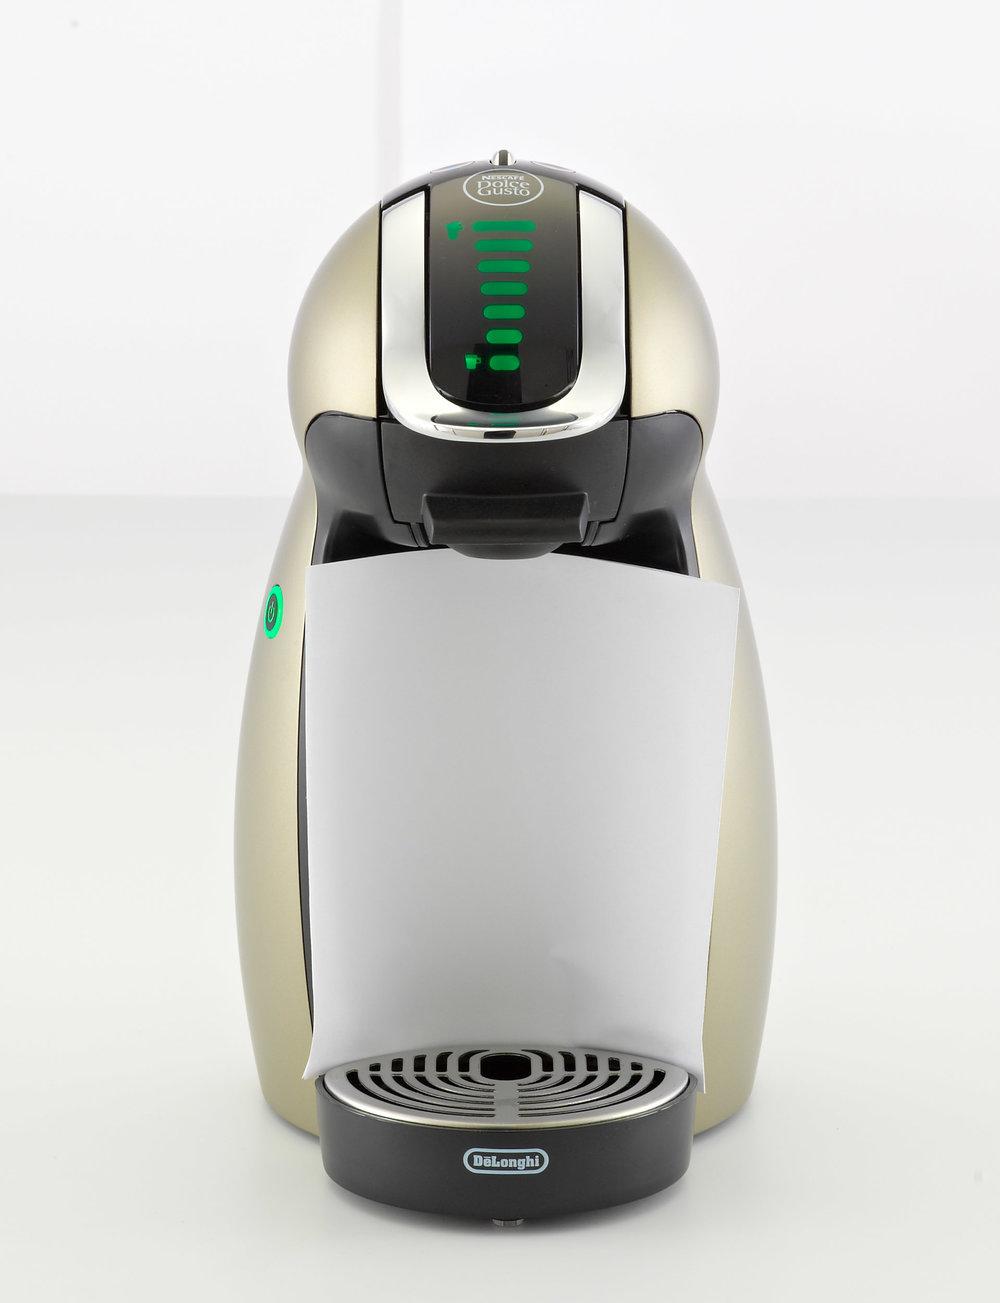 Nescafe Dolce Gusto STRAIGHT ON 7425.jpg